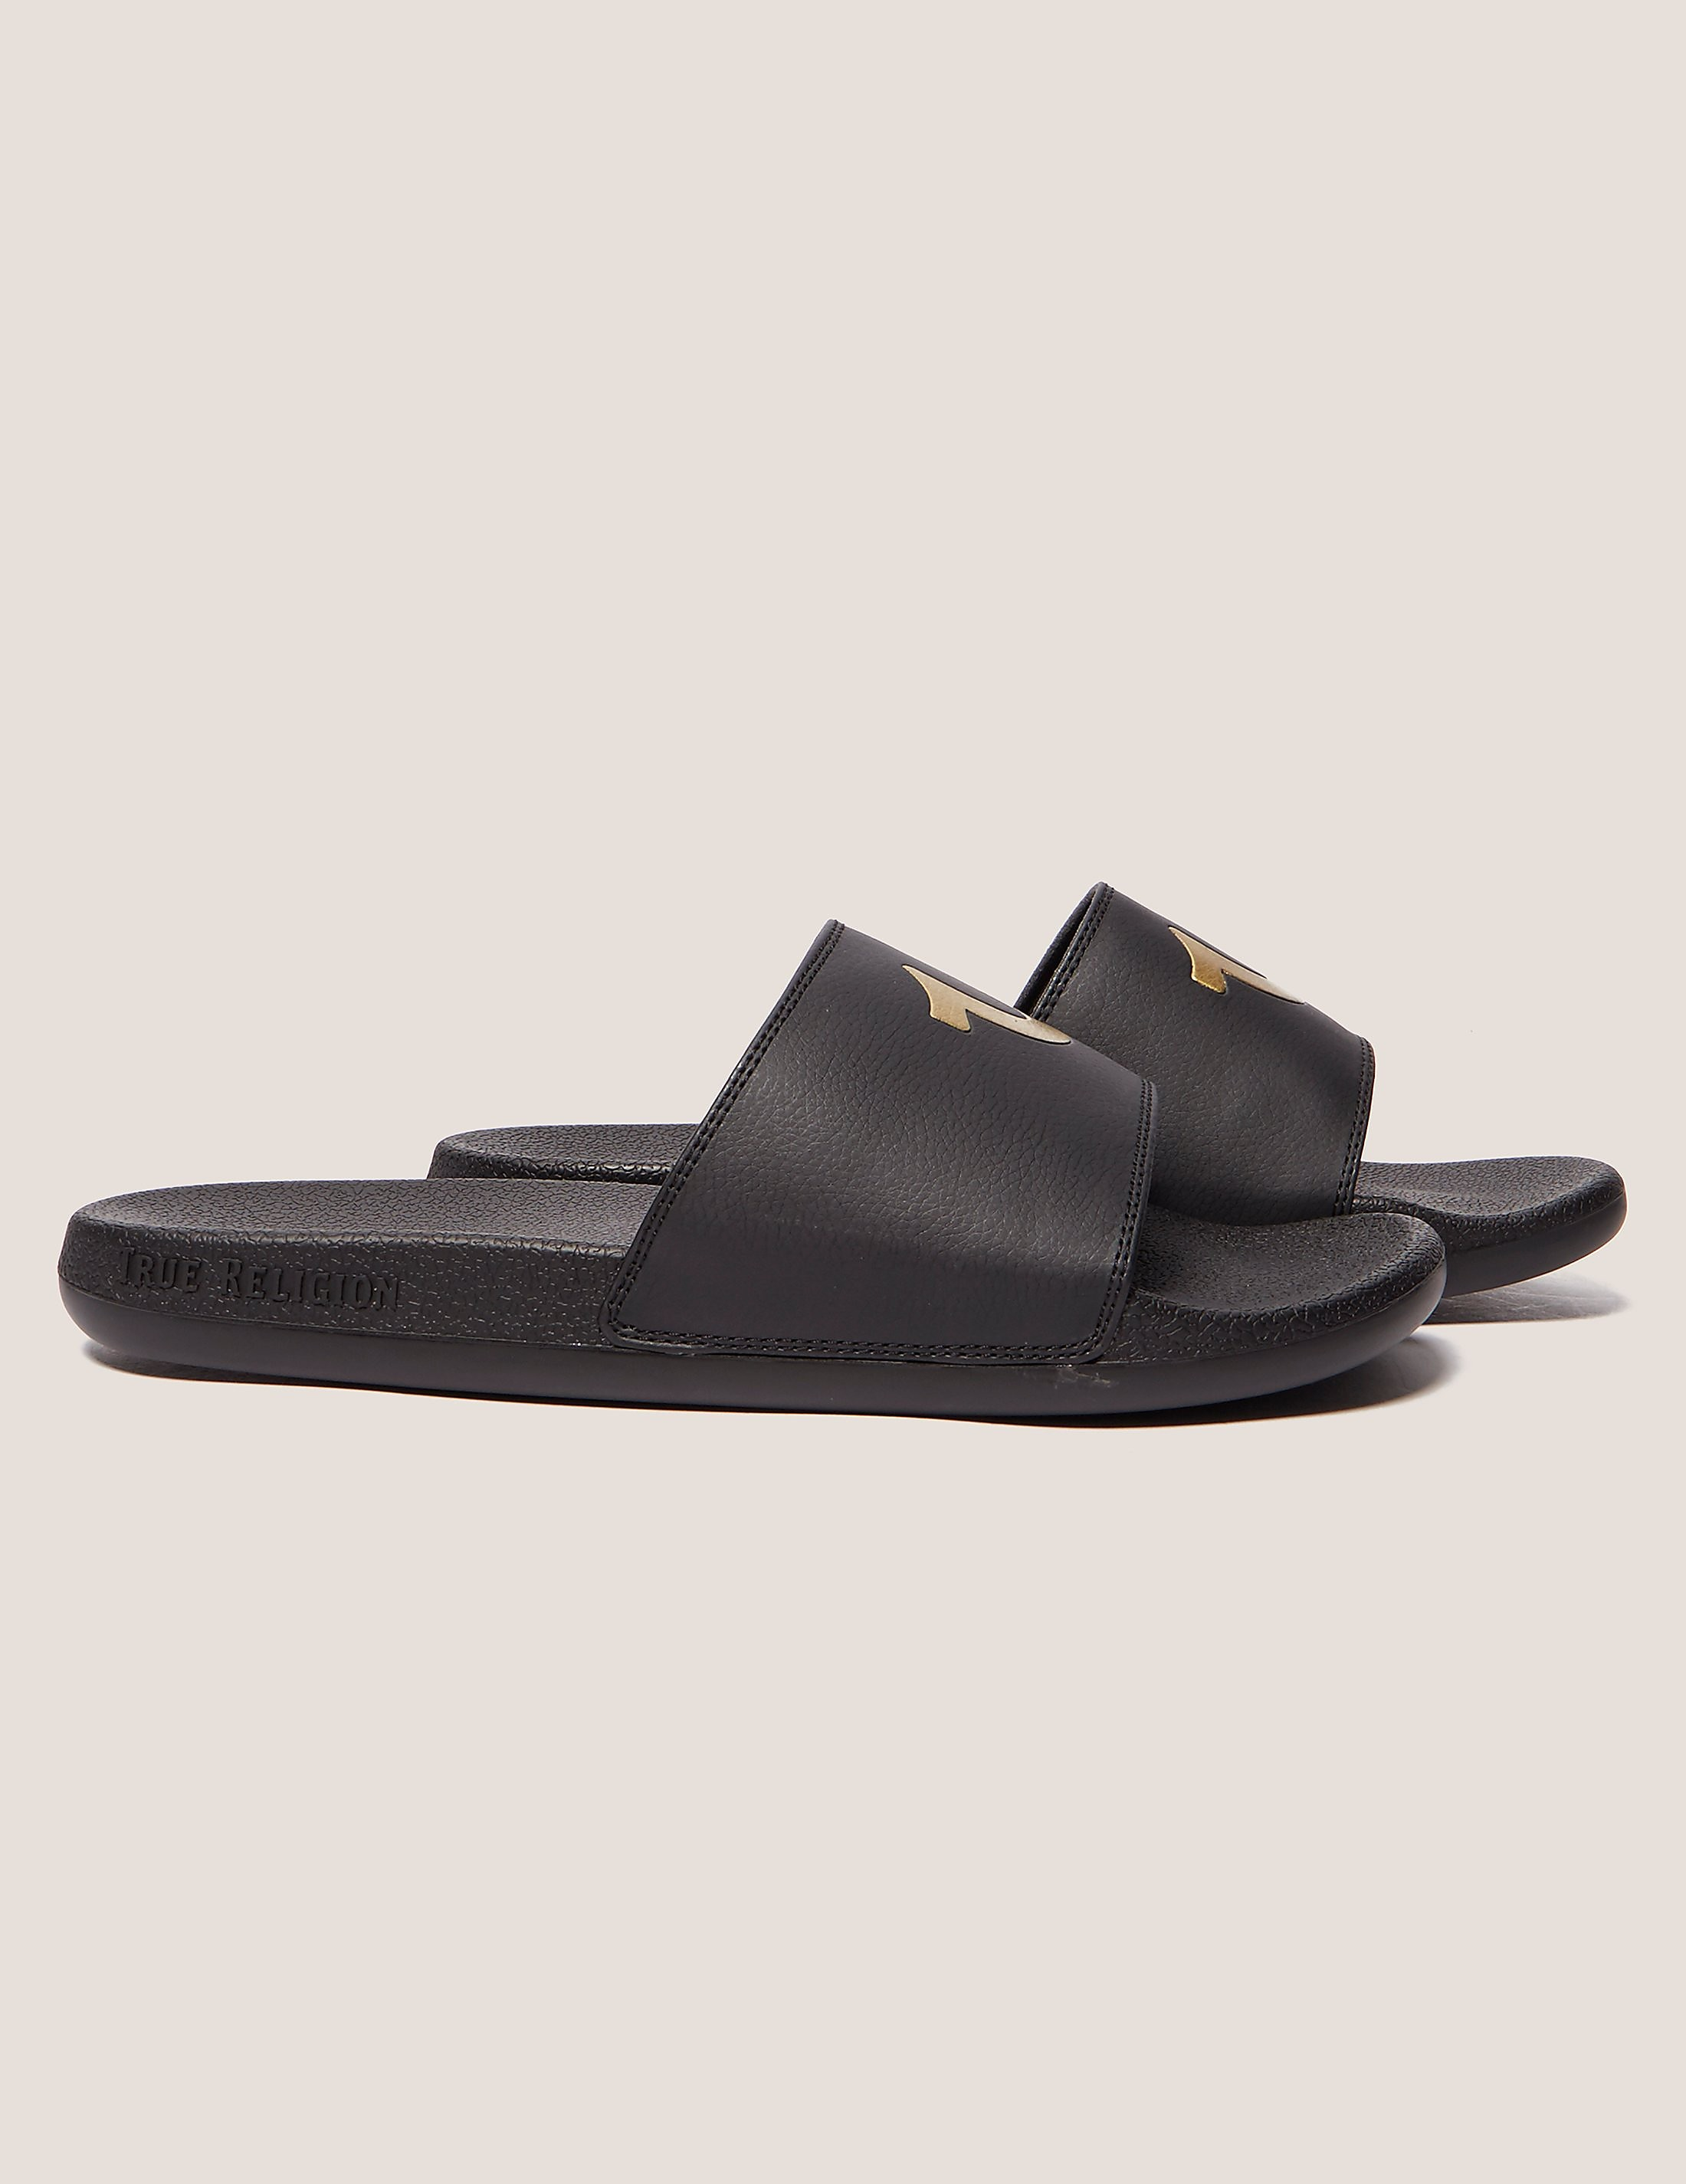 True Religion Horseshoe Slides